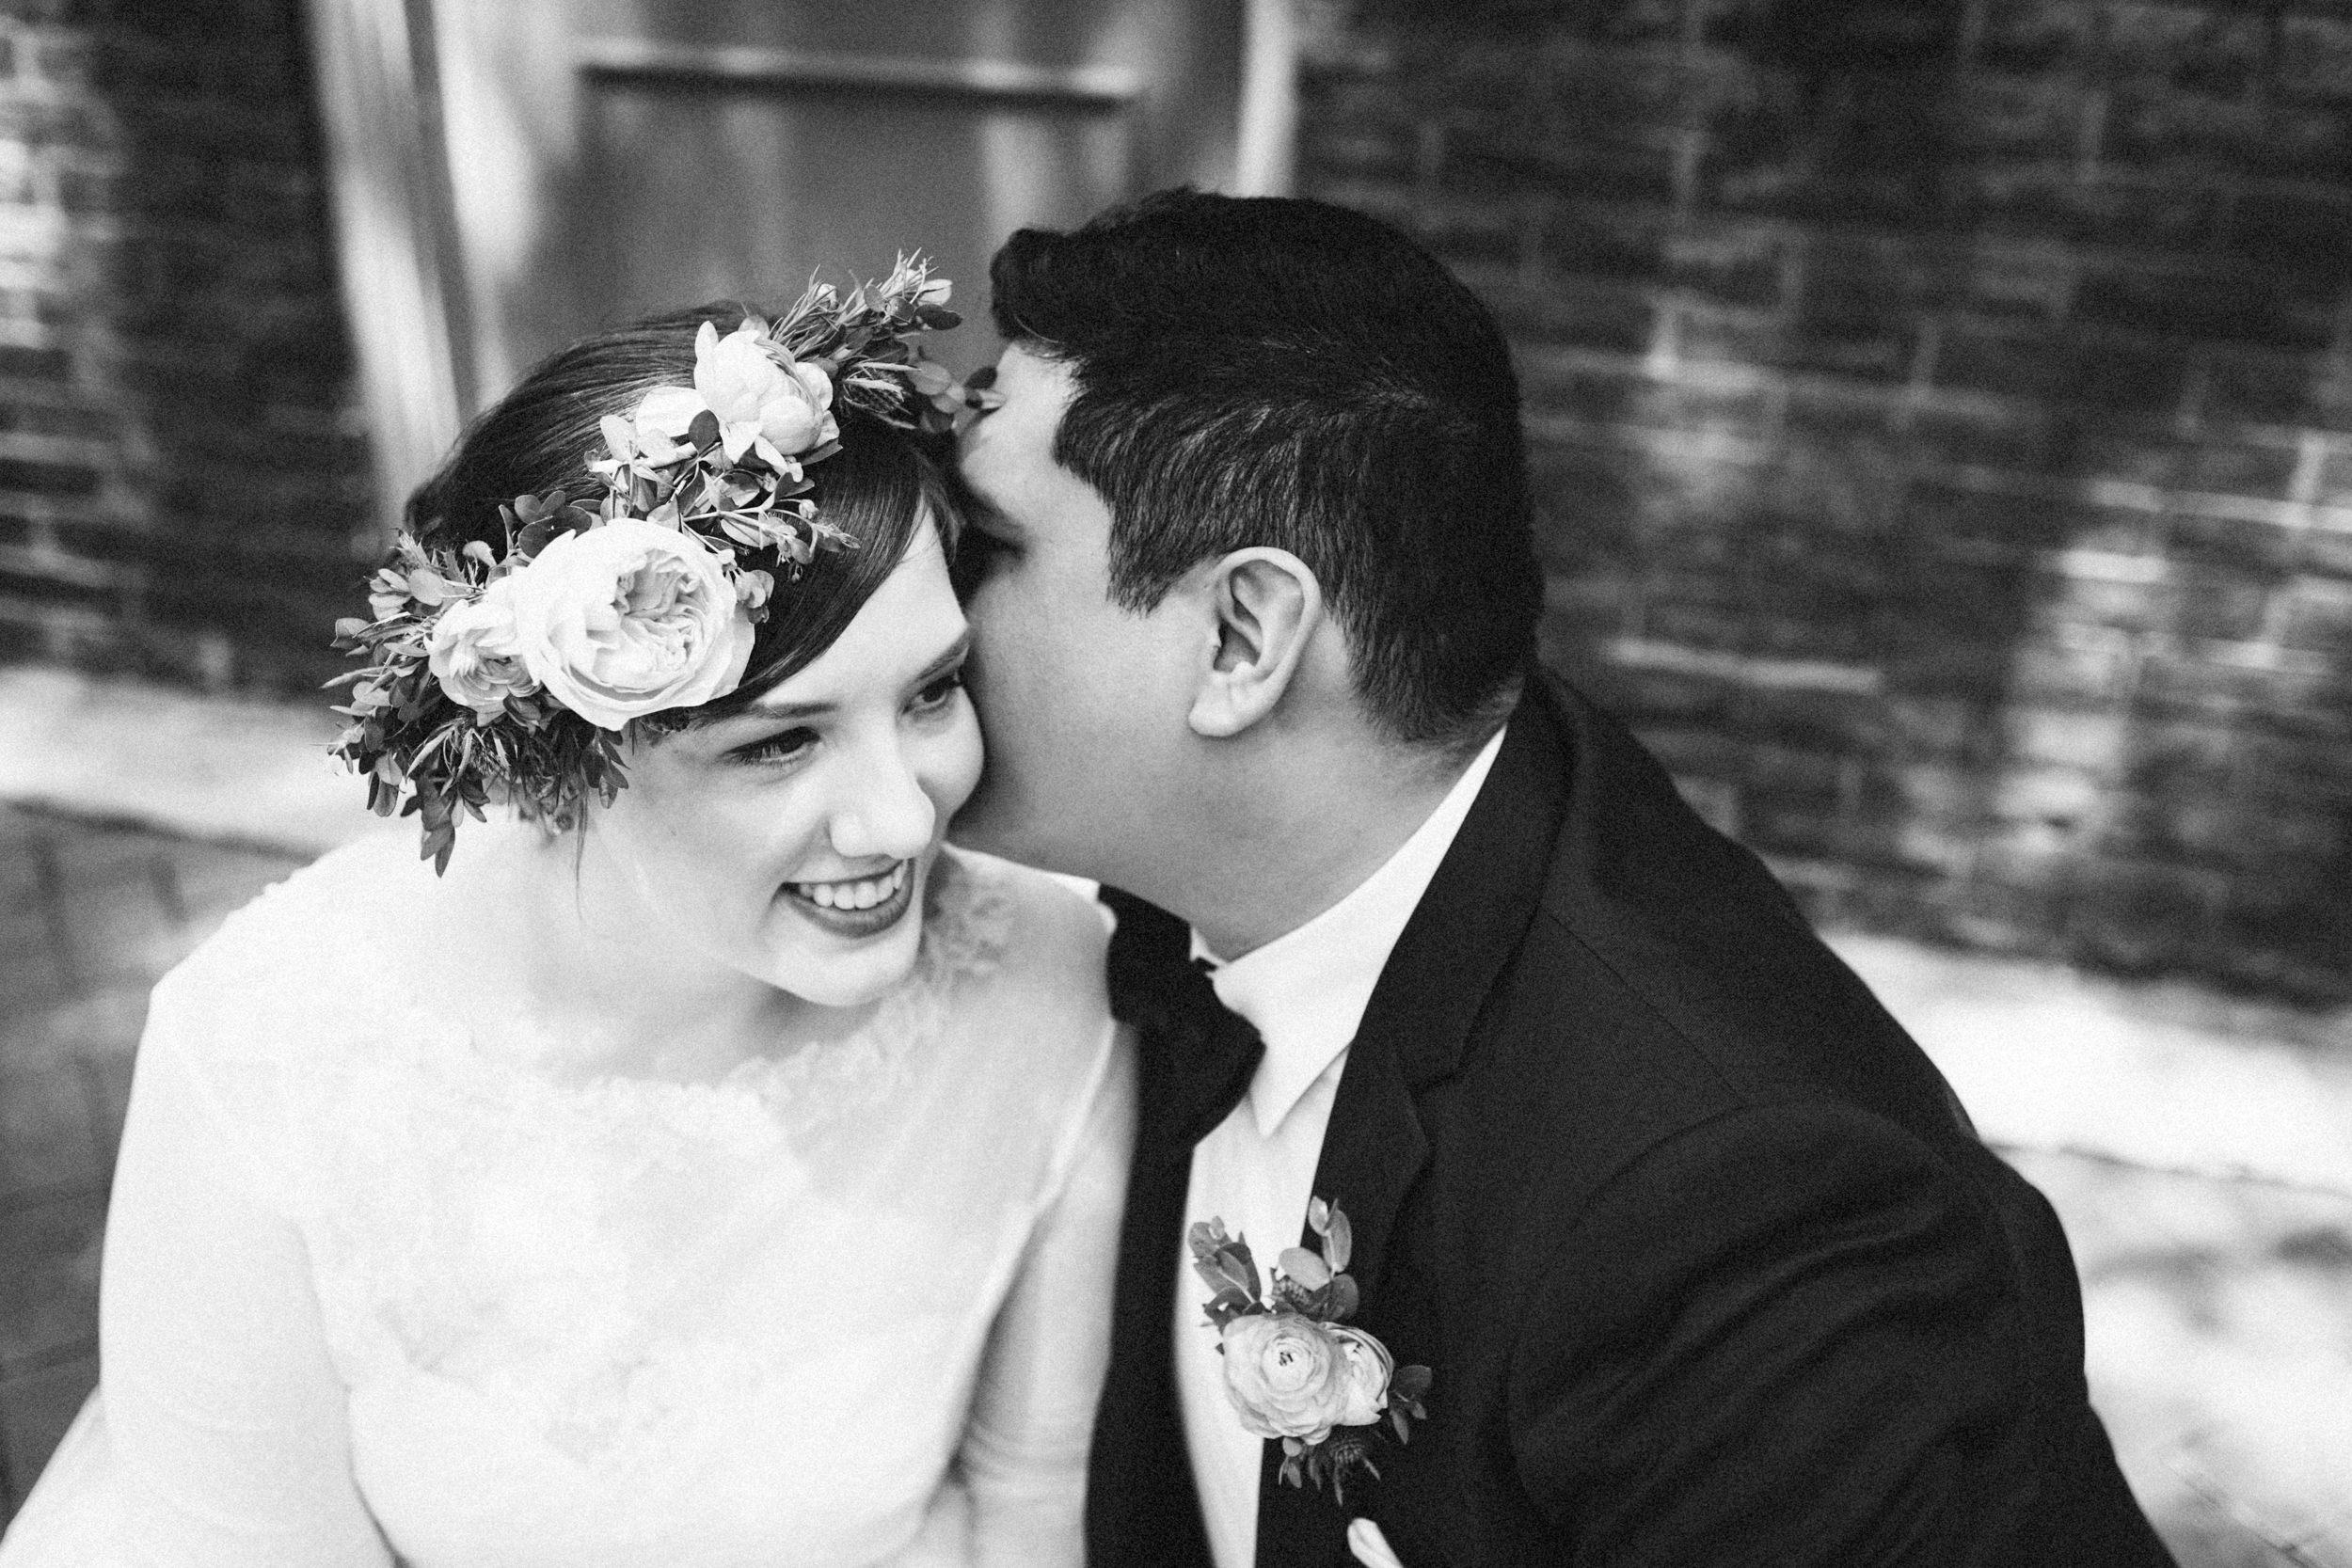 lauren-dean-wedding-grand-lodge-kentucky-sarah-katherine-davis-photography-214bw.jpg